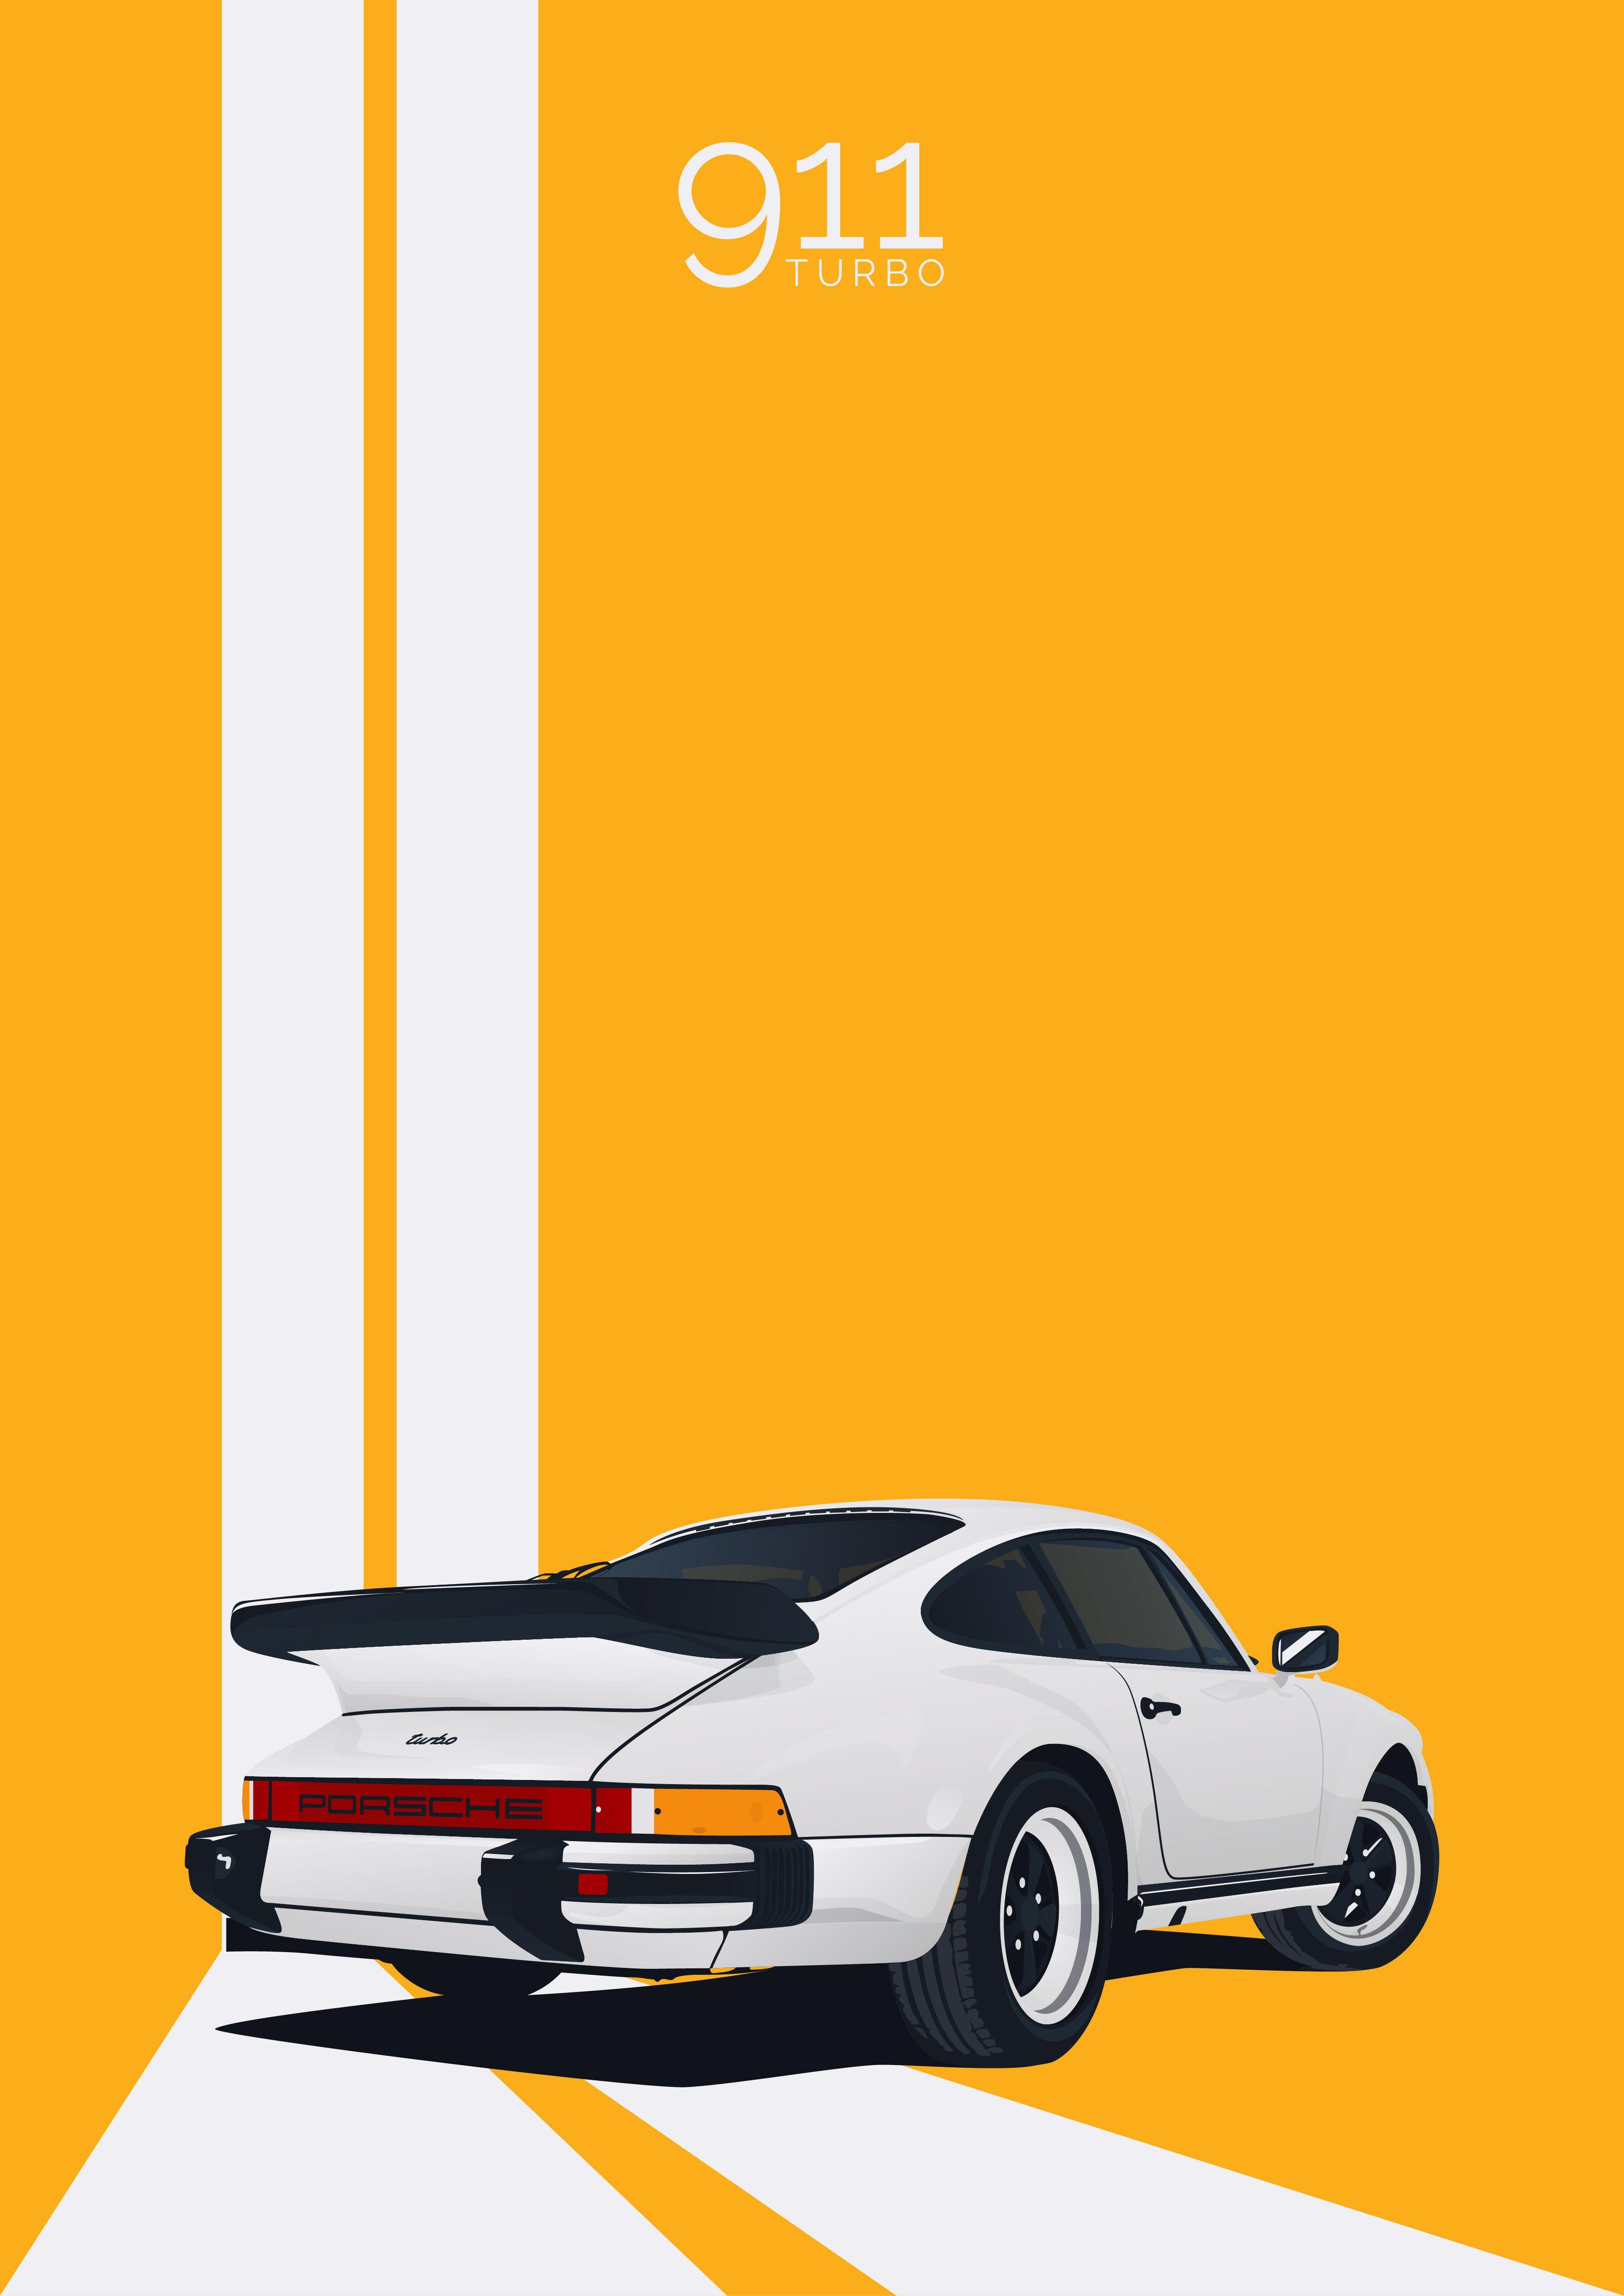 Pin By Jordan Halasan On Ilustracja Inspiracja In 2020 Art Cars Car Illustration Automotive Artwork